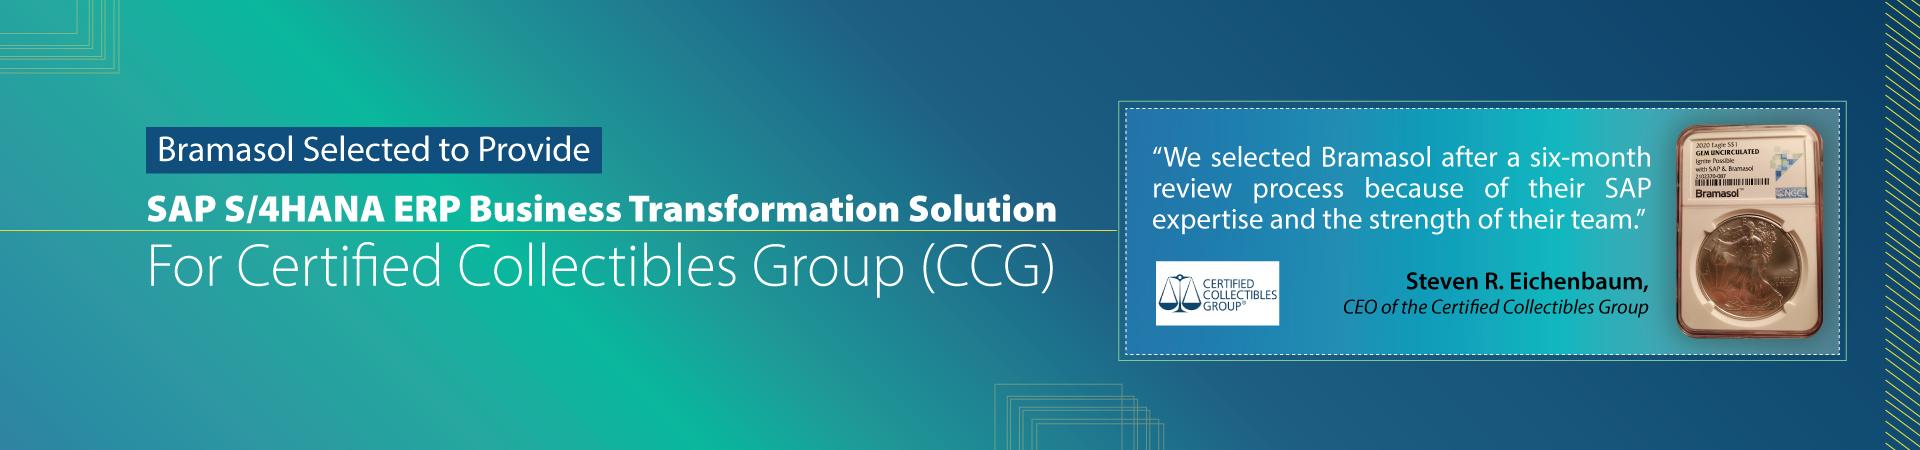 SAP S/4HANA ERP Business Transformation Solution For CCG Slider